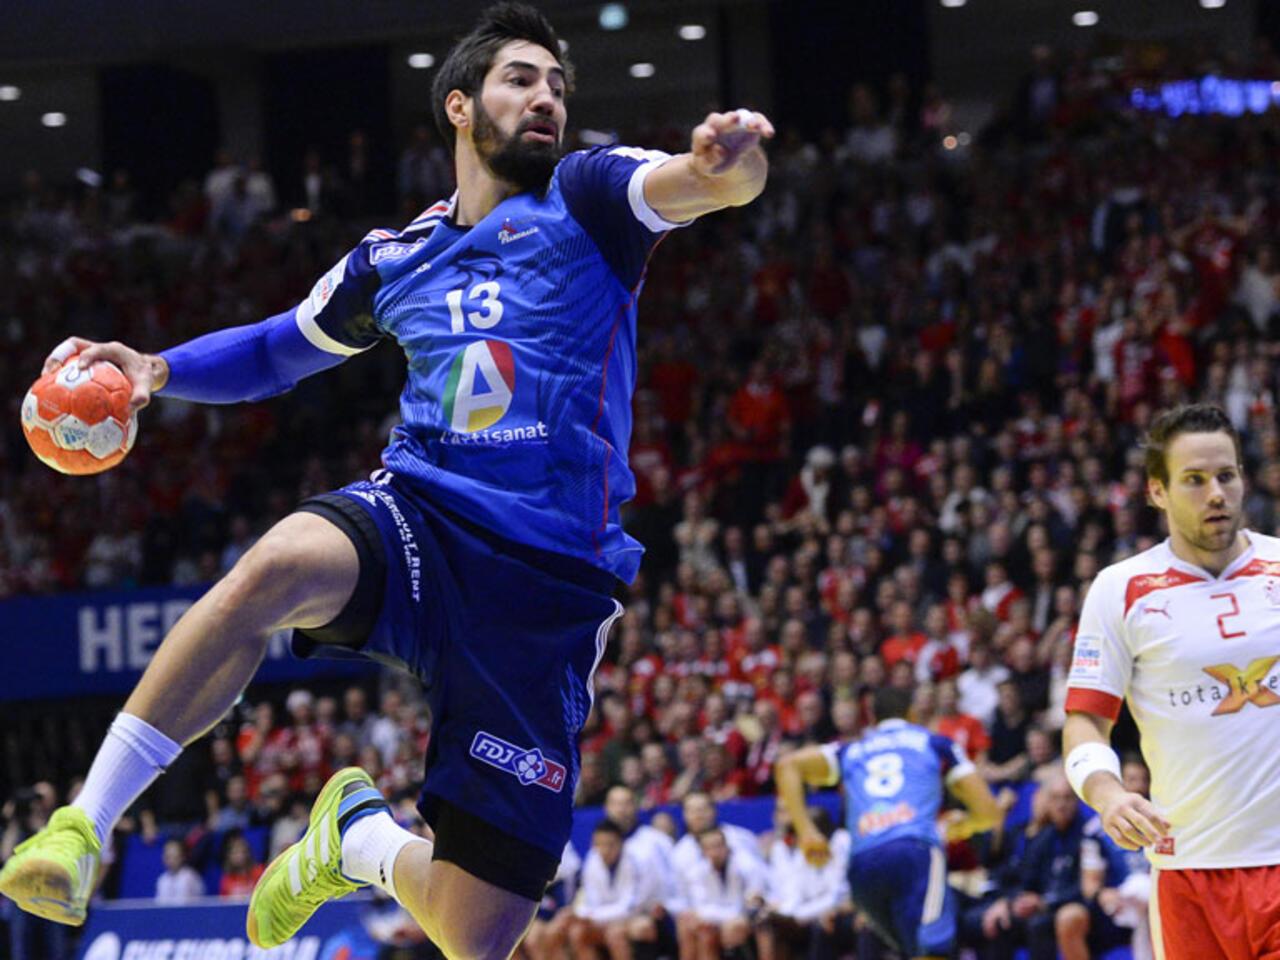 Handball Enjoys Another Winning Moment In French Spotlight